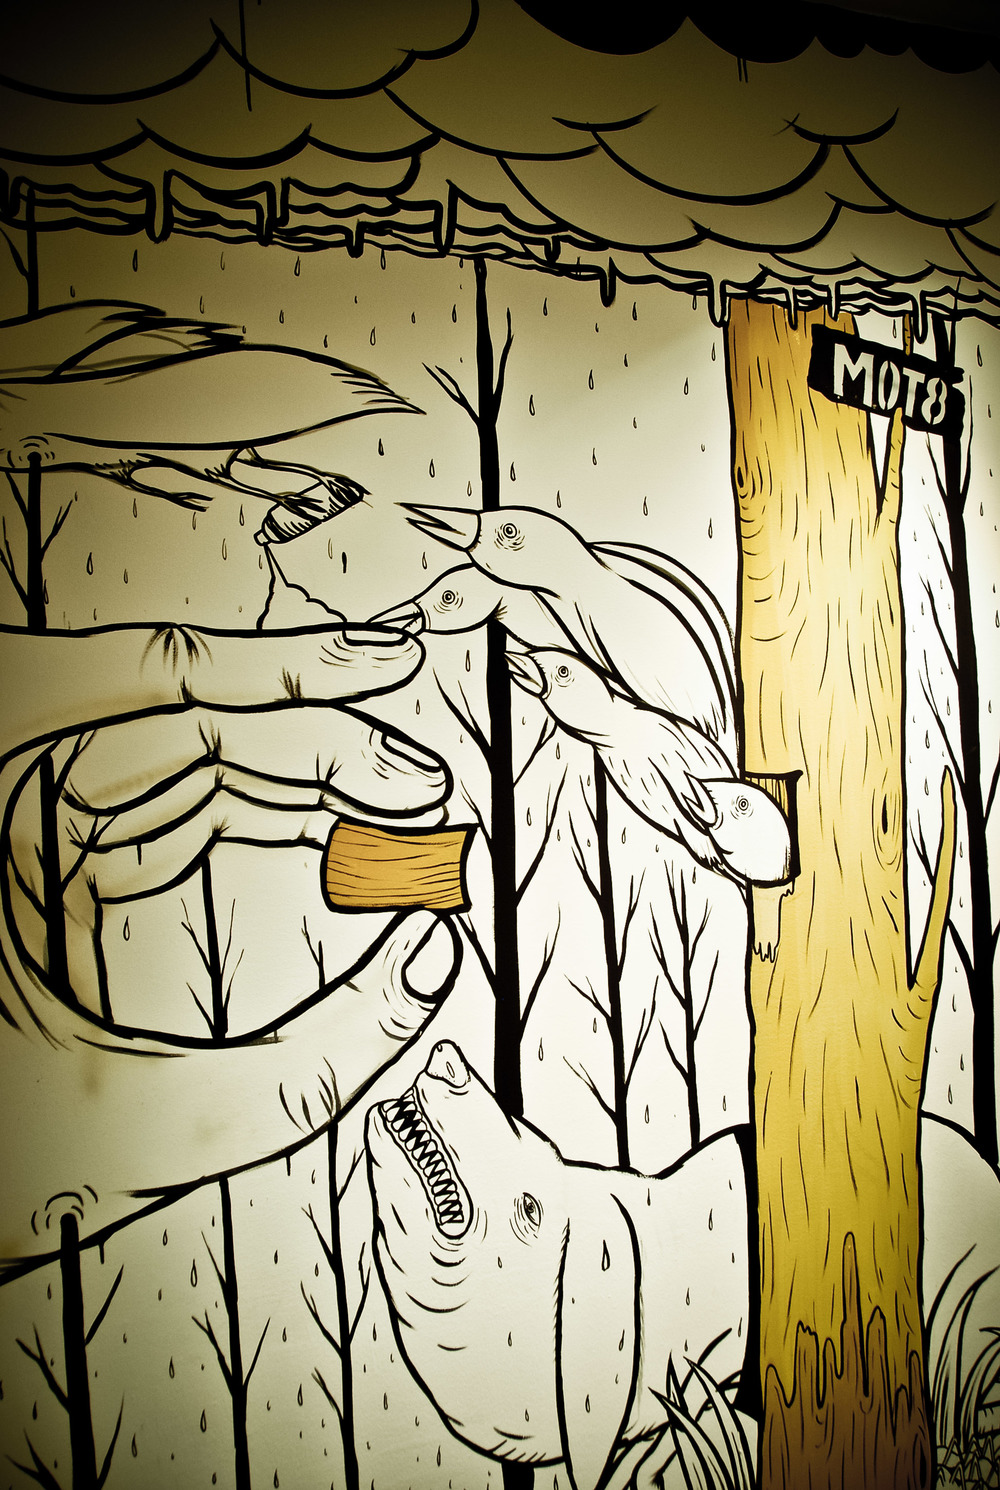 arco o2 mot8 street art style